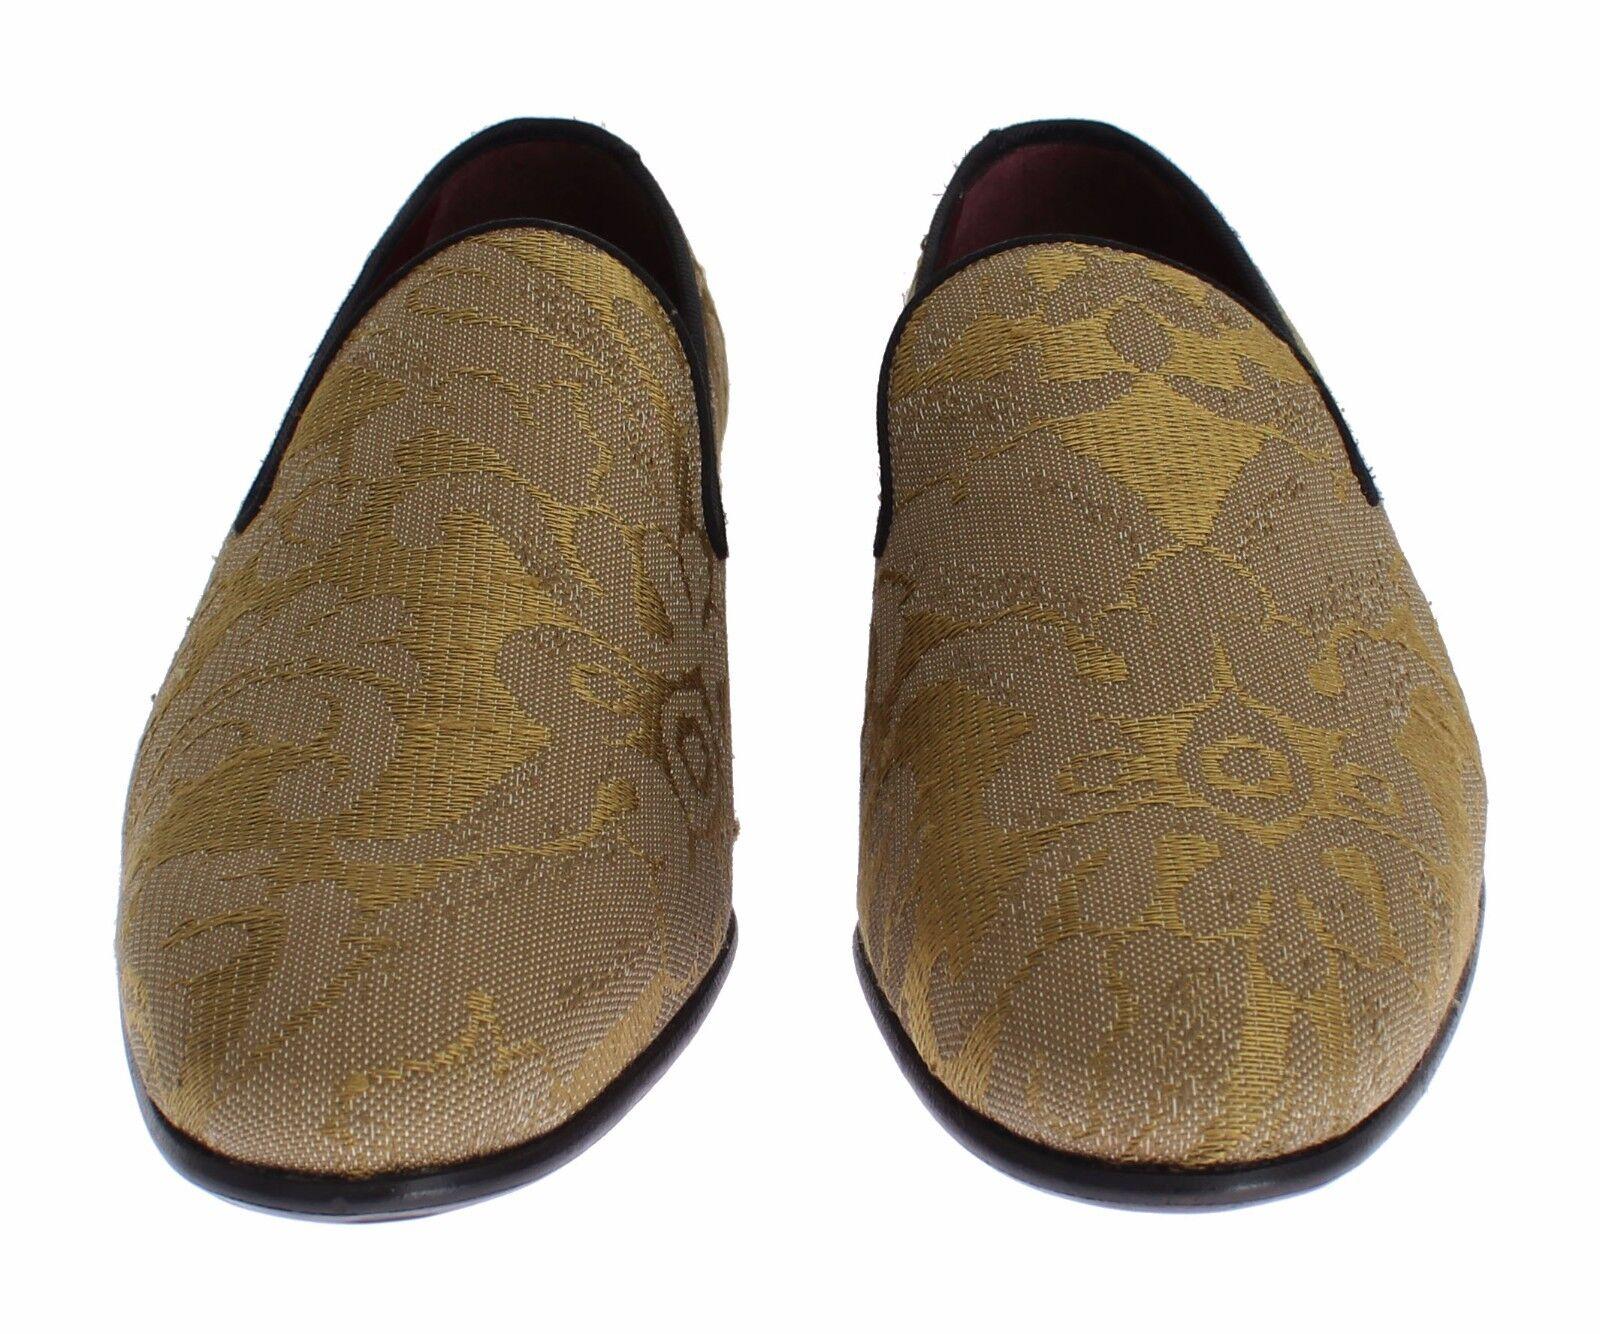 des baskets nike nike nike   ebernon haut noir chaussures bleues 2018 * * meilleur vendeur e35e09